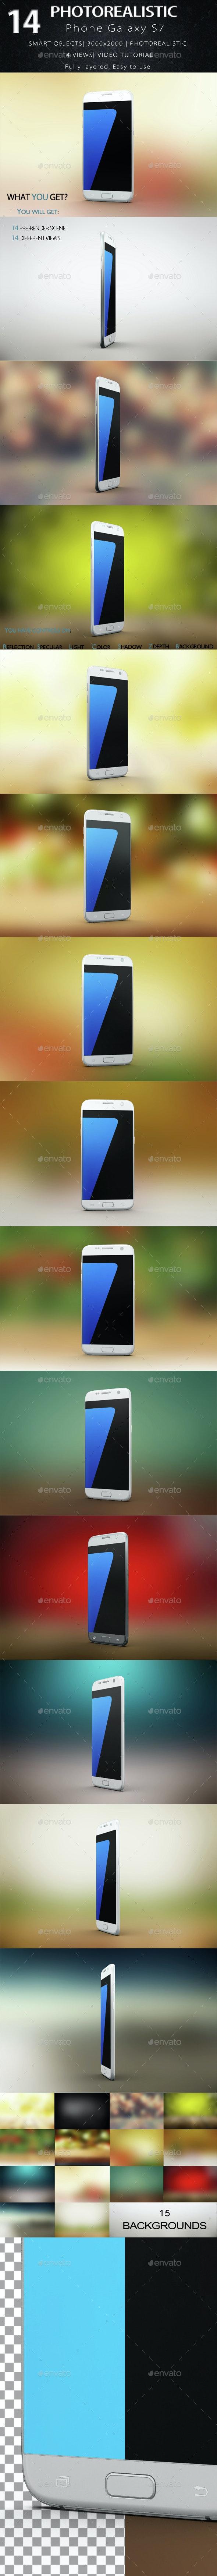 Smartphone Galaxy s7 Mock Up - Product Mock-Ups Graphics